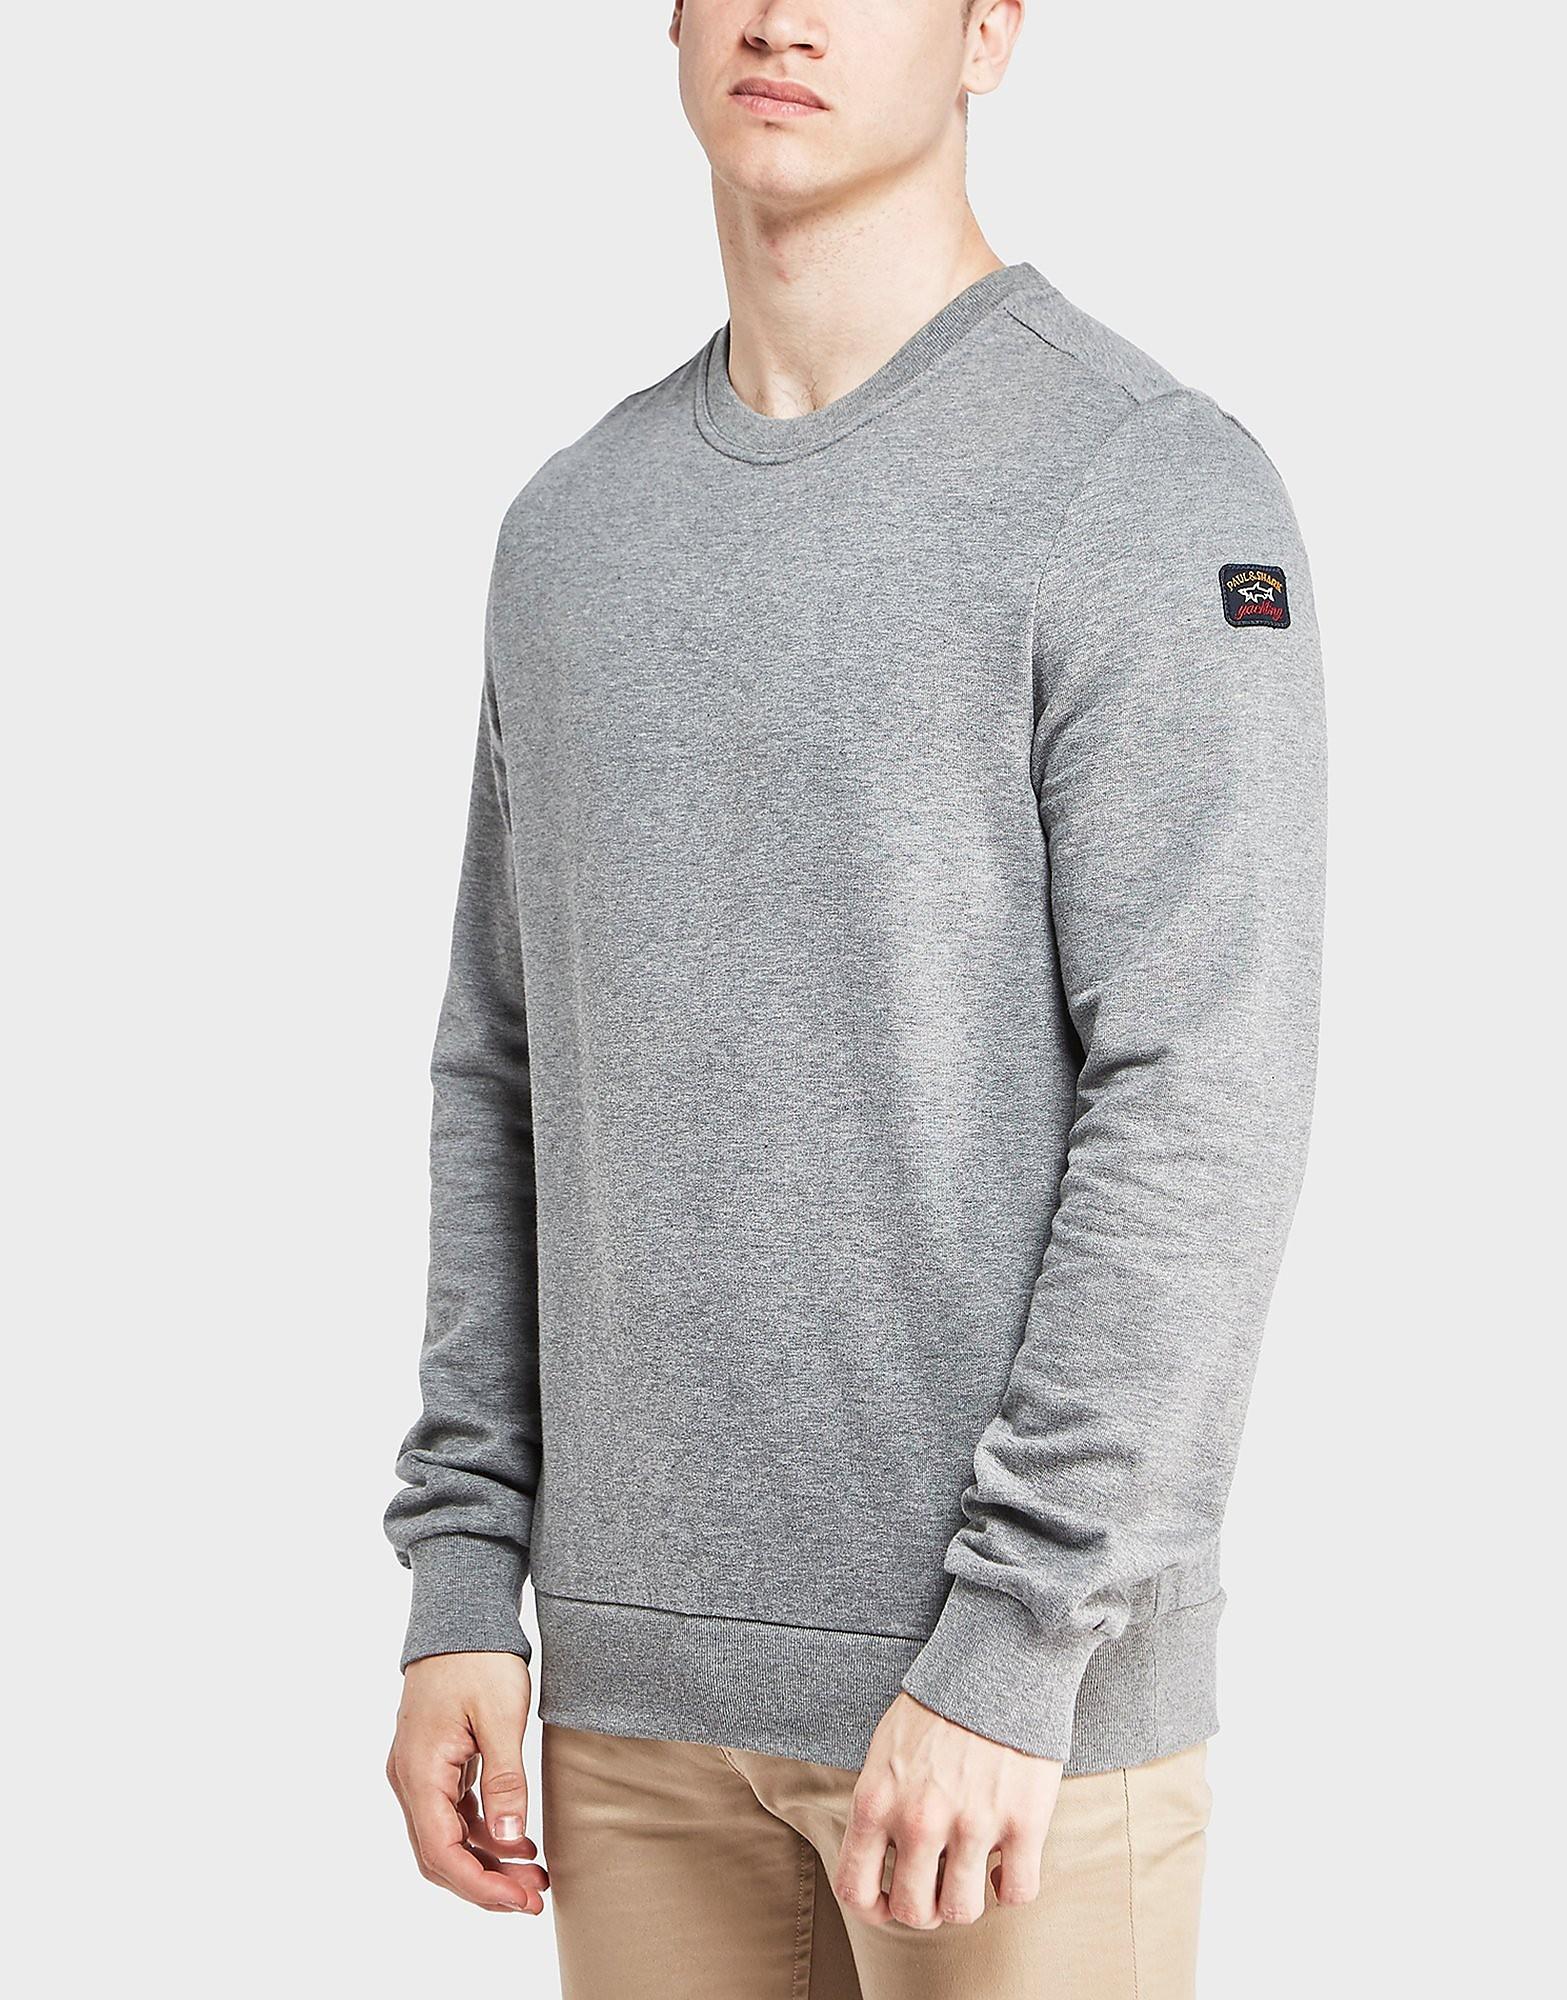 Paul and Shark Crew Sweatshirt